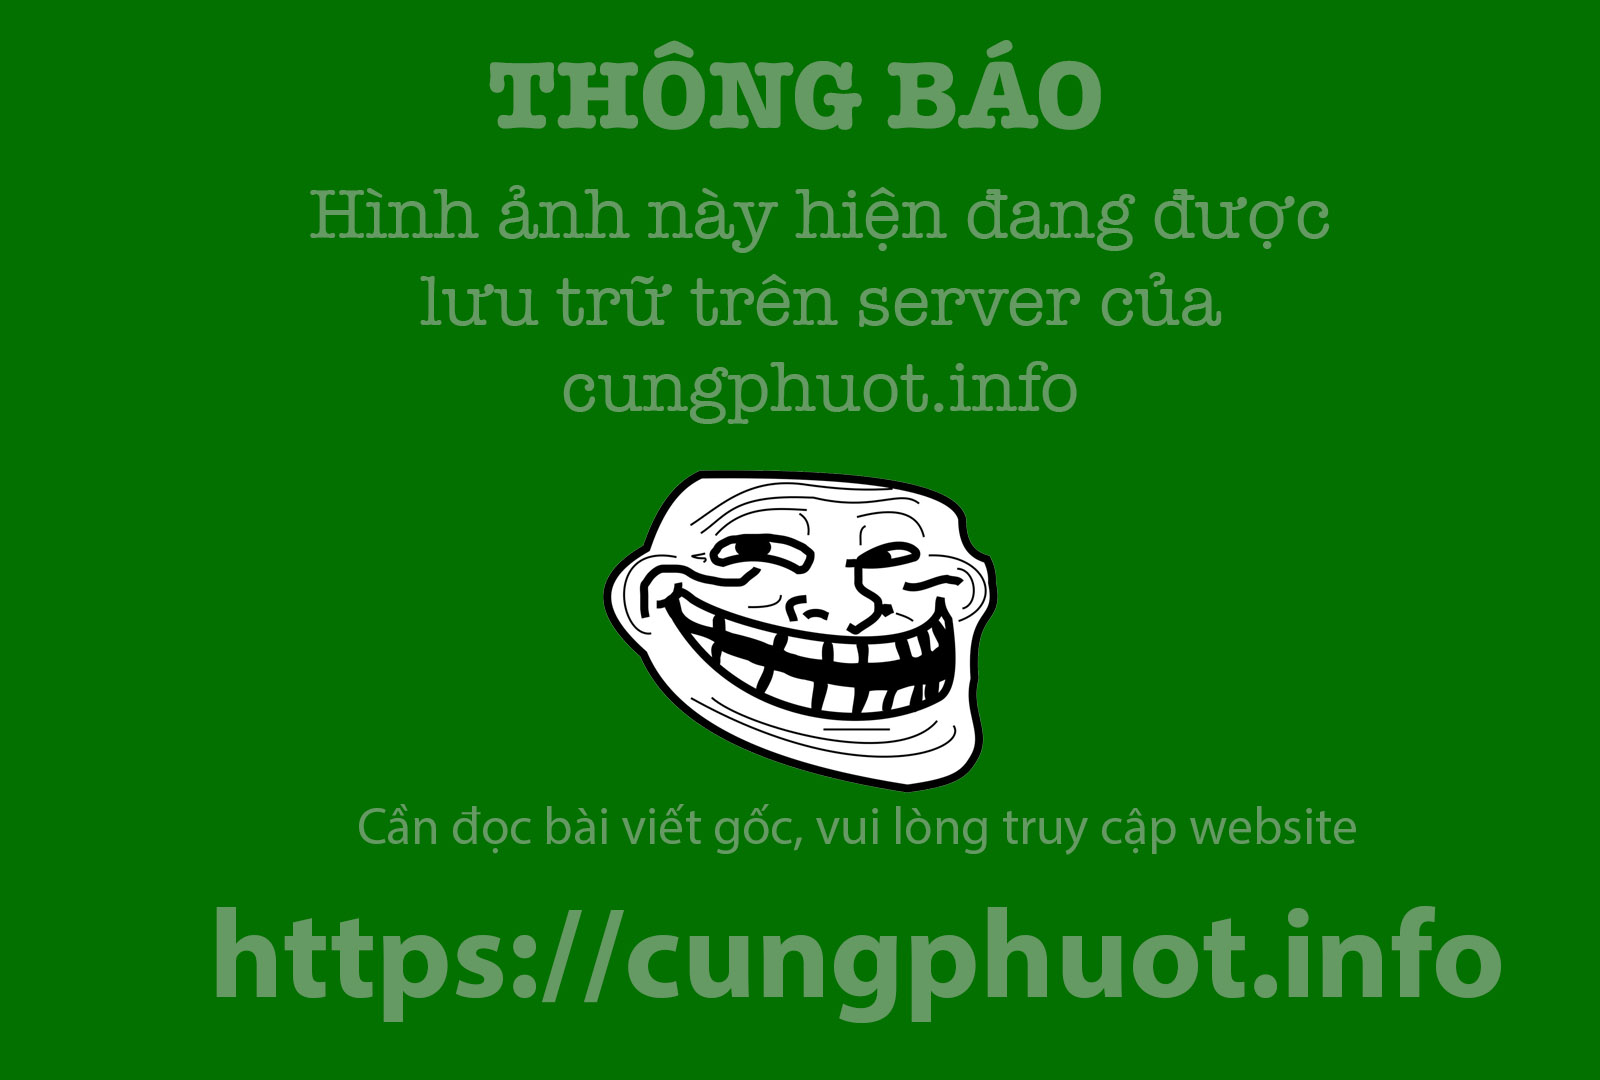 Dan phuot me man ve dep ky vi cua hang Prai o Quang Tri hinh anh 14